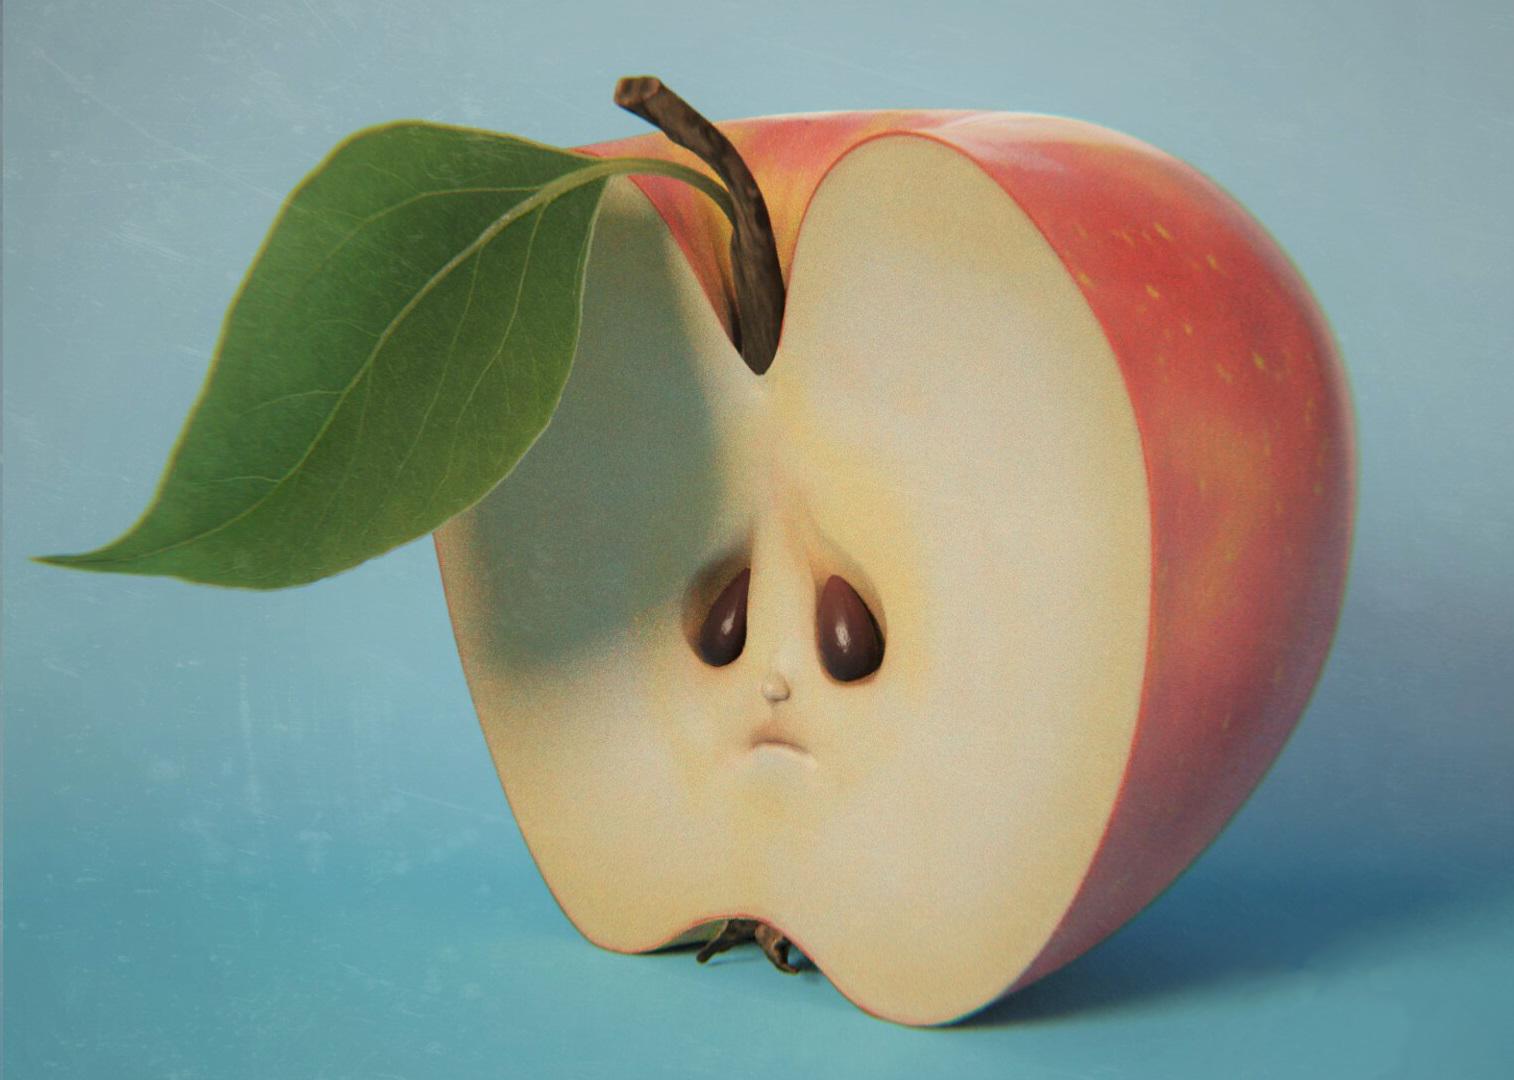 Manzanas aburridas